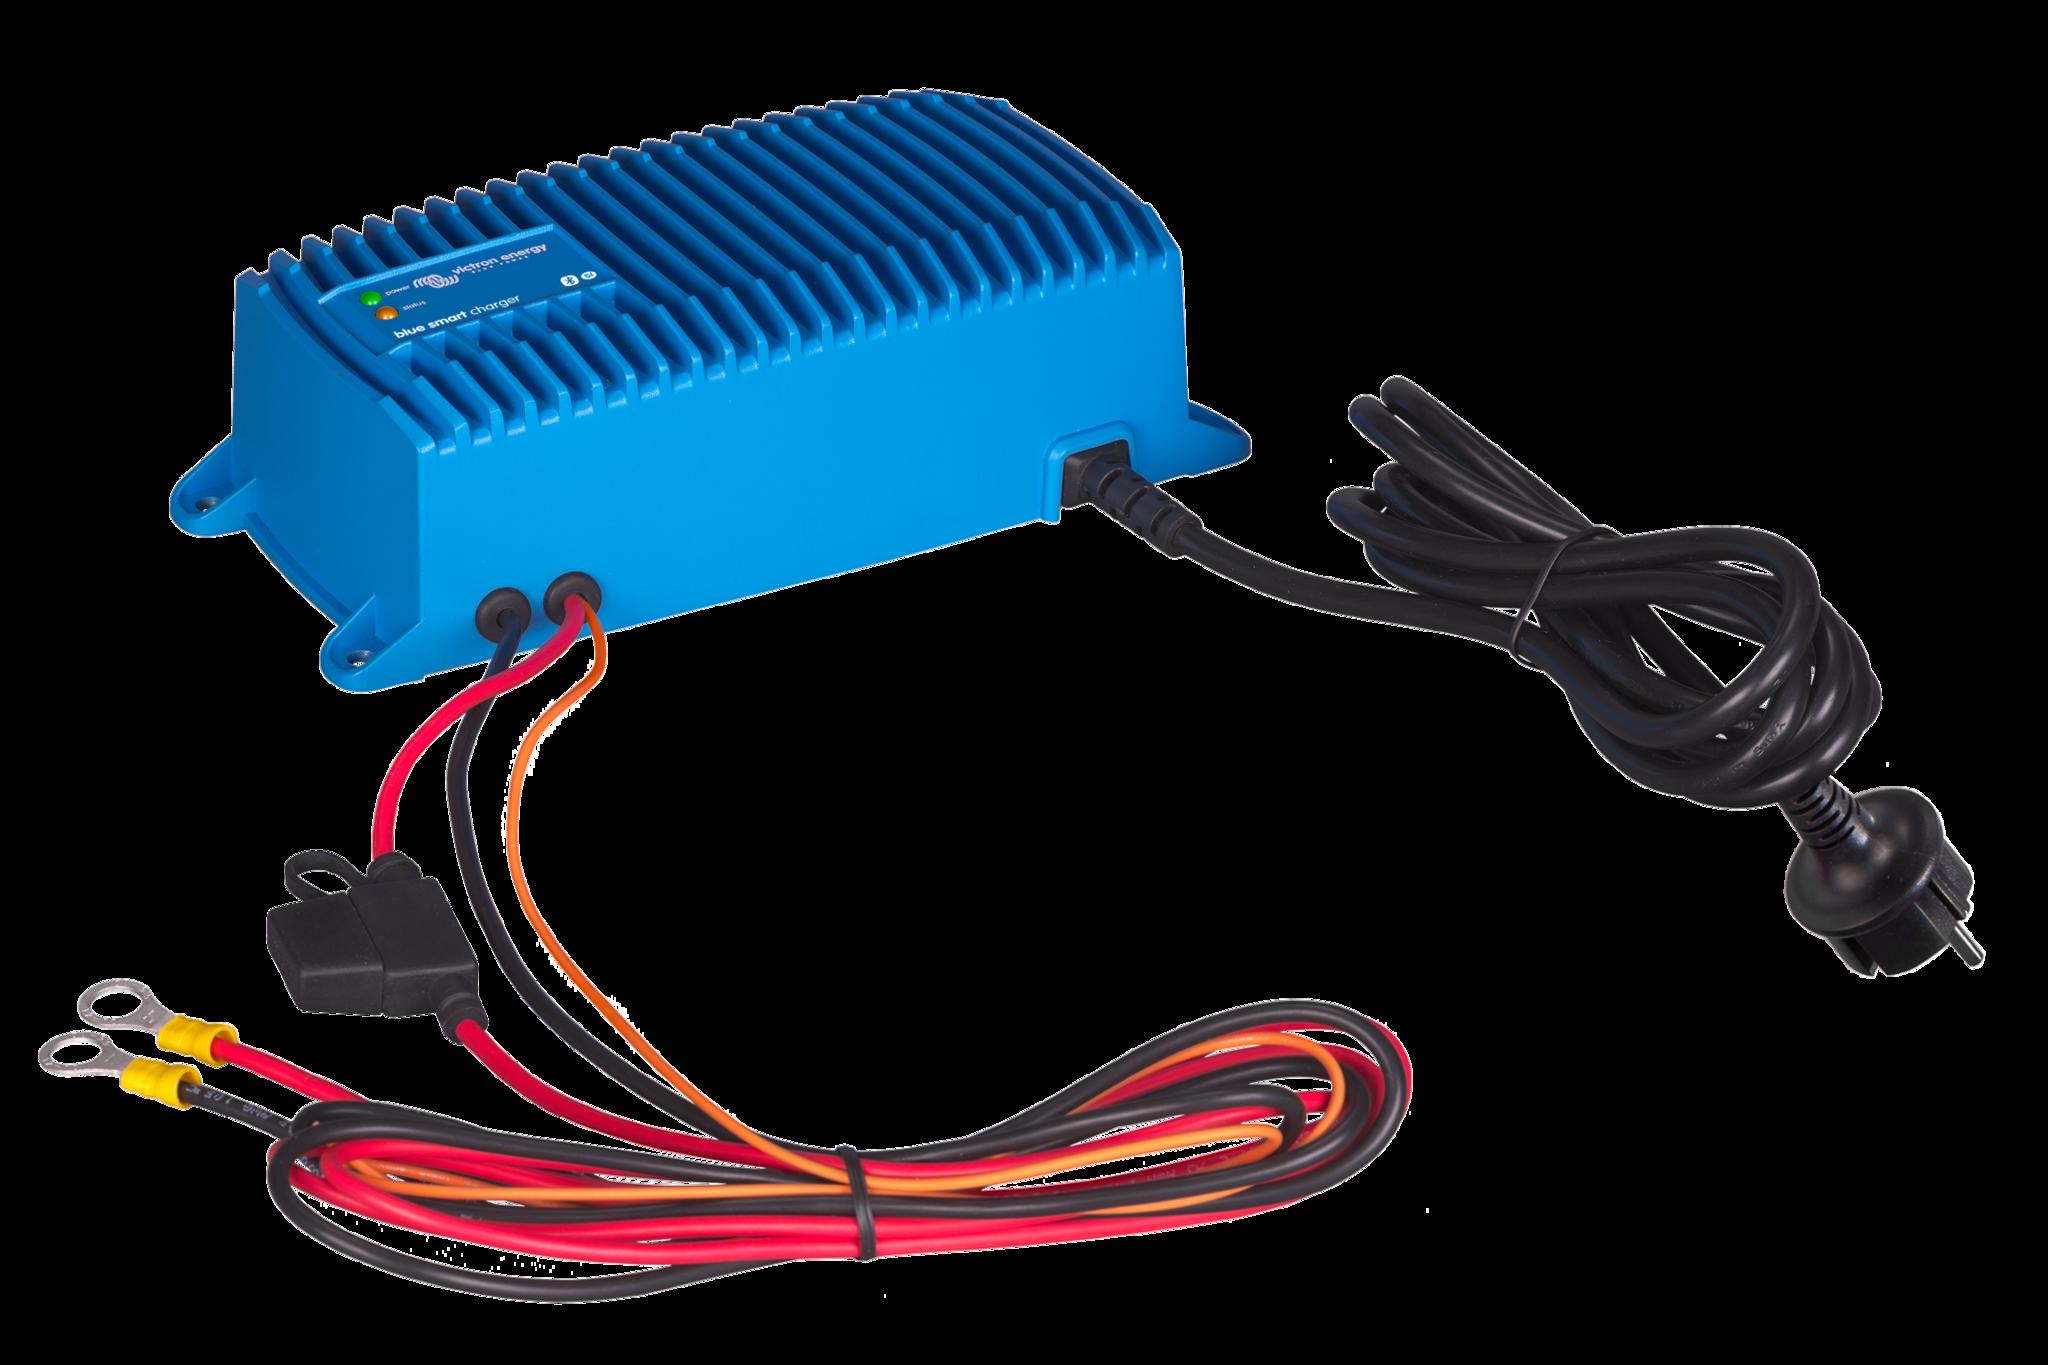 Batterie Ladegerät Microprozessor gesteuert Blue Smart IP67 (Wasserdicht)